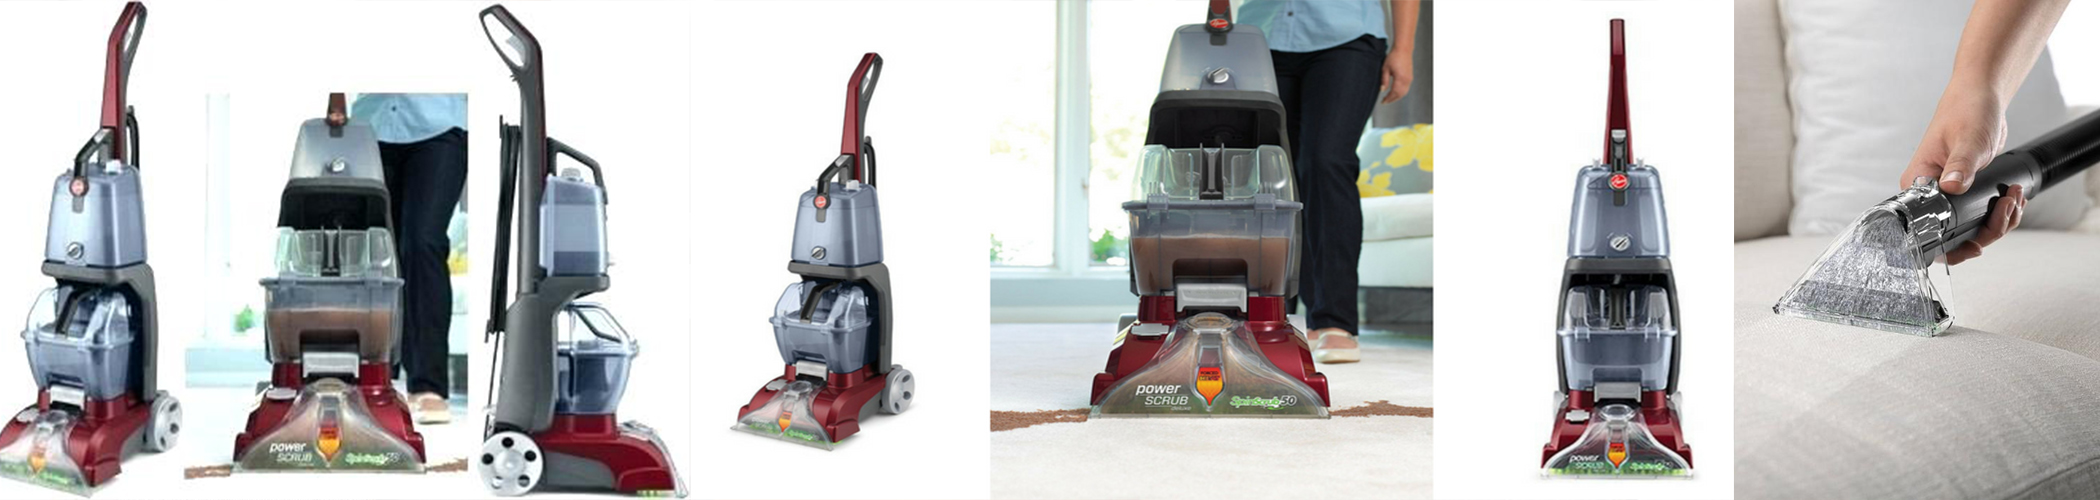 Hoover FH50150 Carpet Basics Power Scrub Deluxe Carpet Vacuum Cleaner